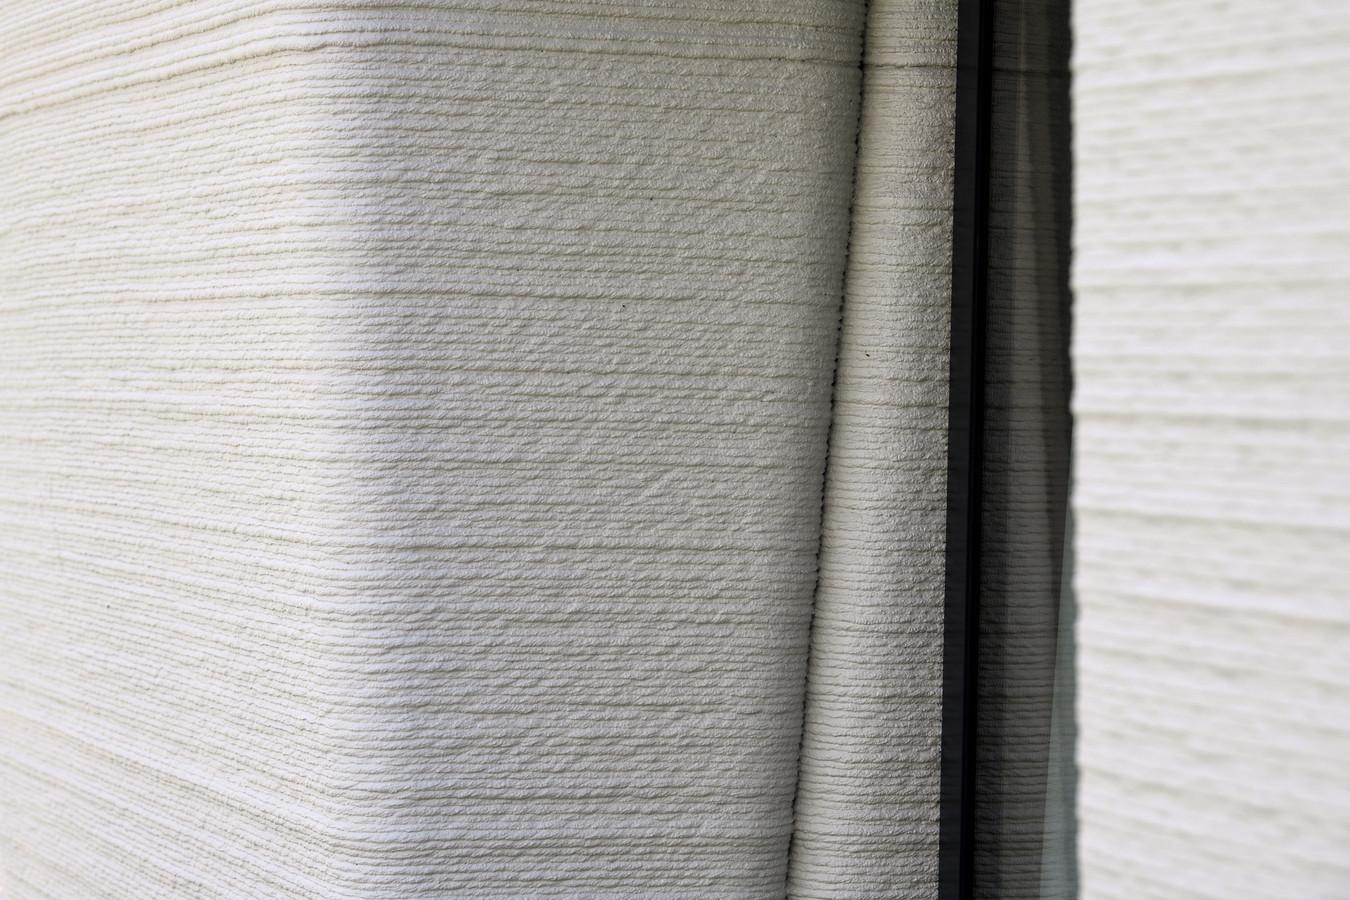 close-up materiaal